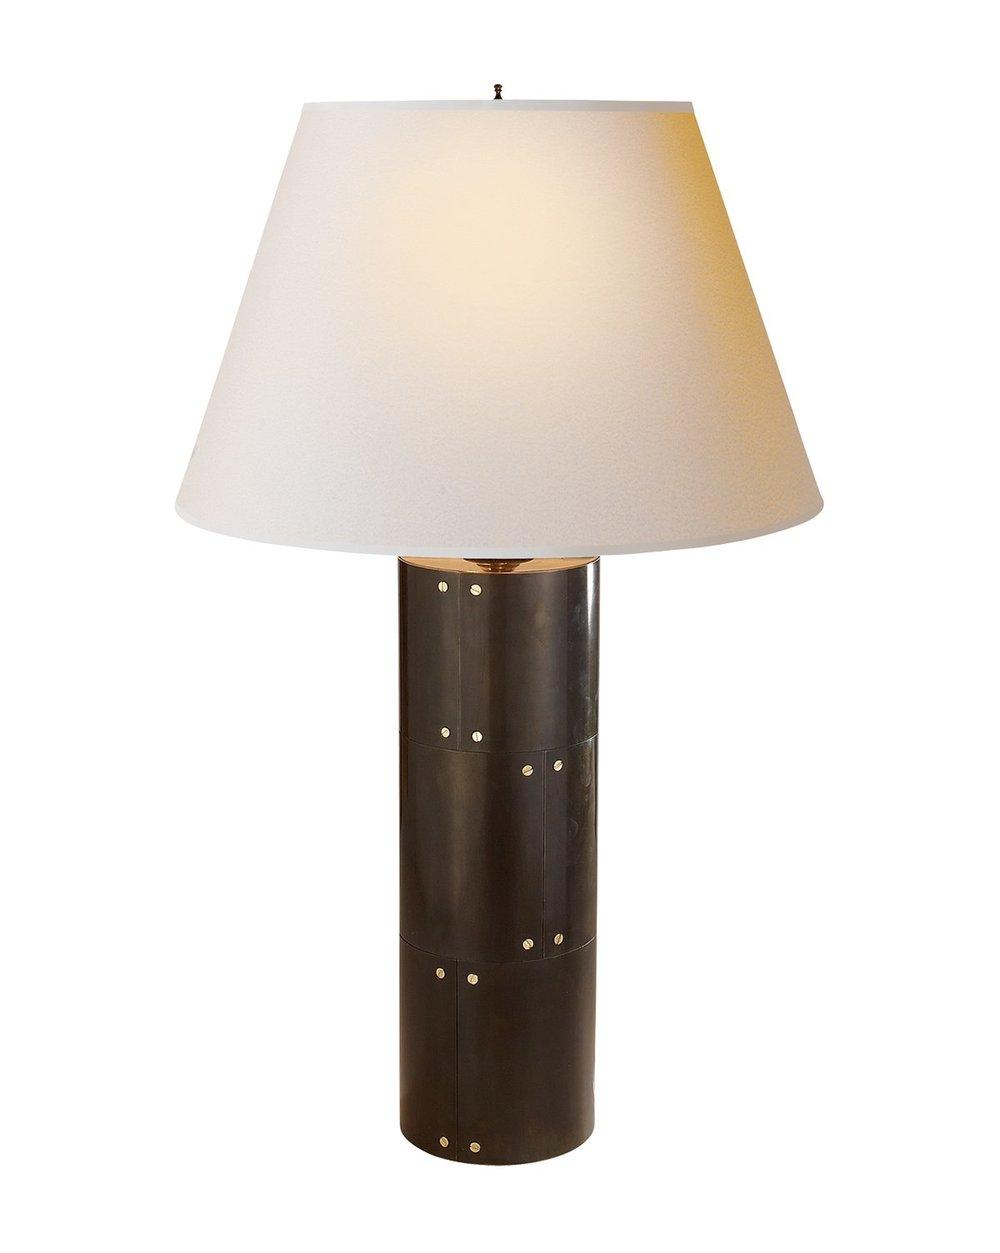 Yul_Table_Lamp_2.jpg